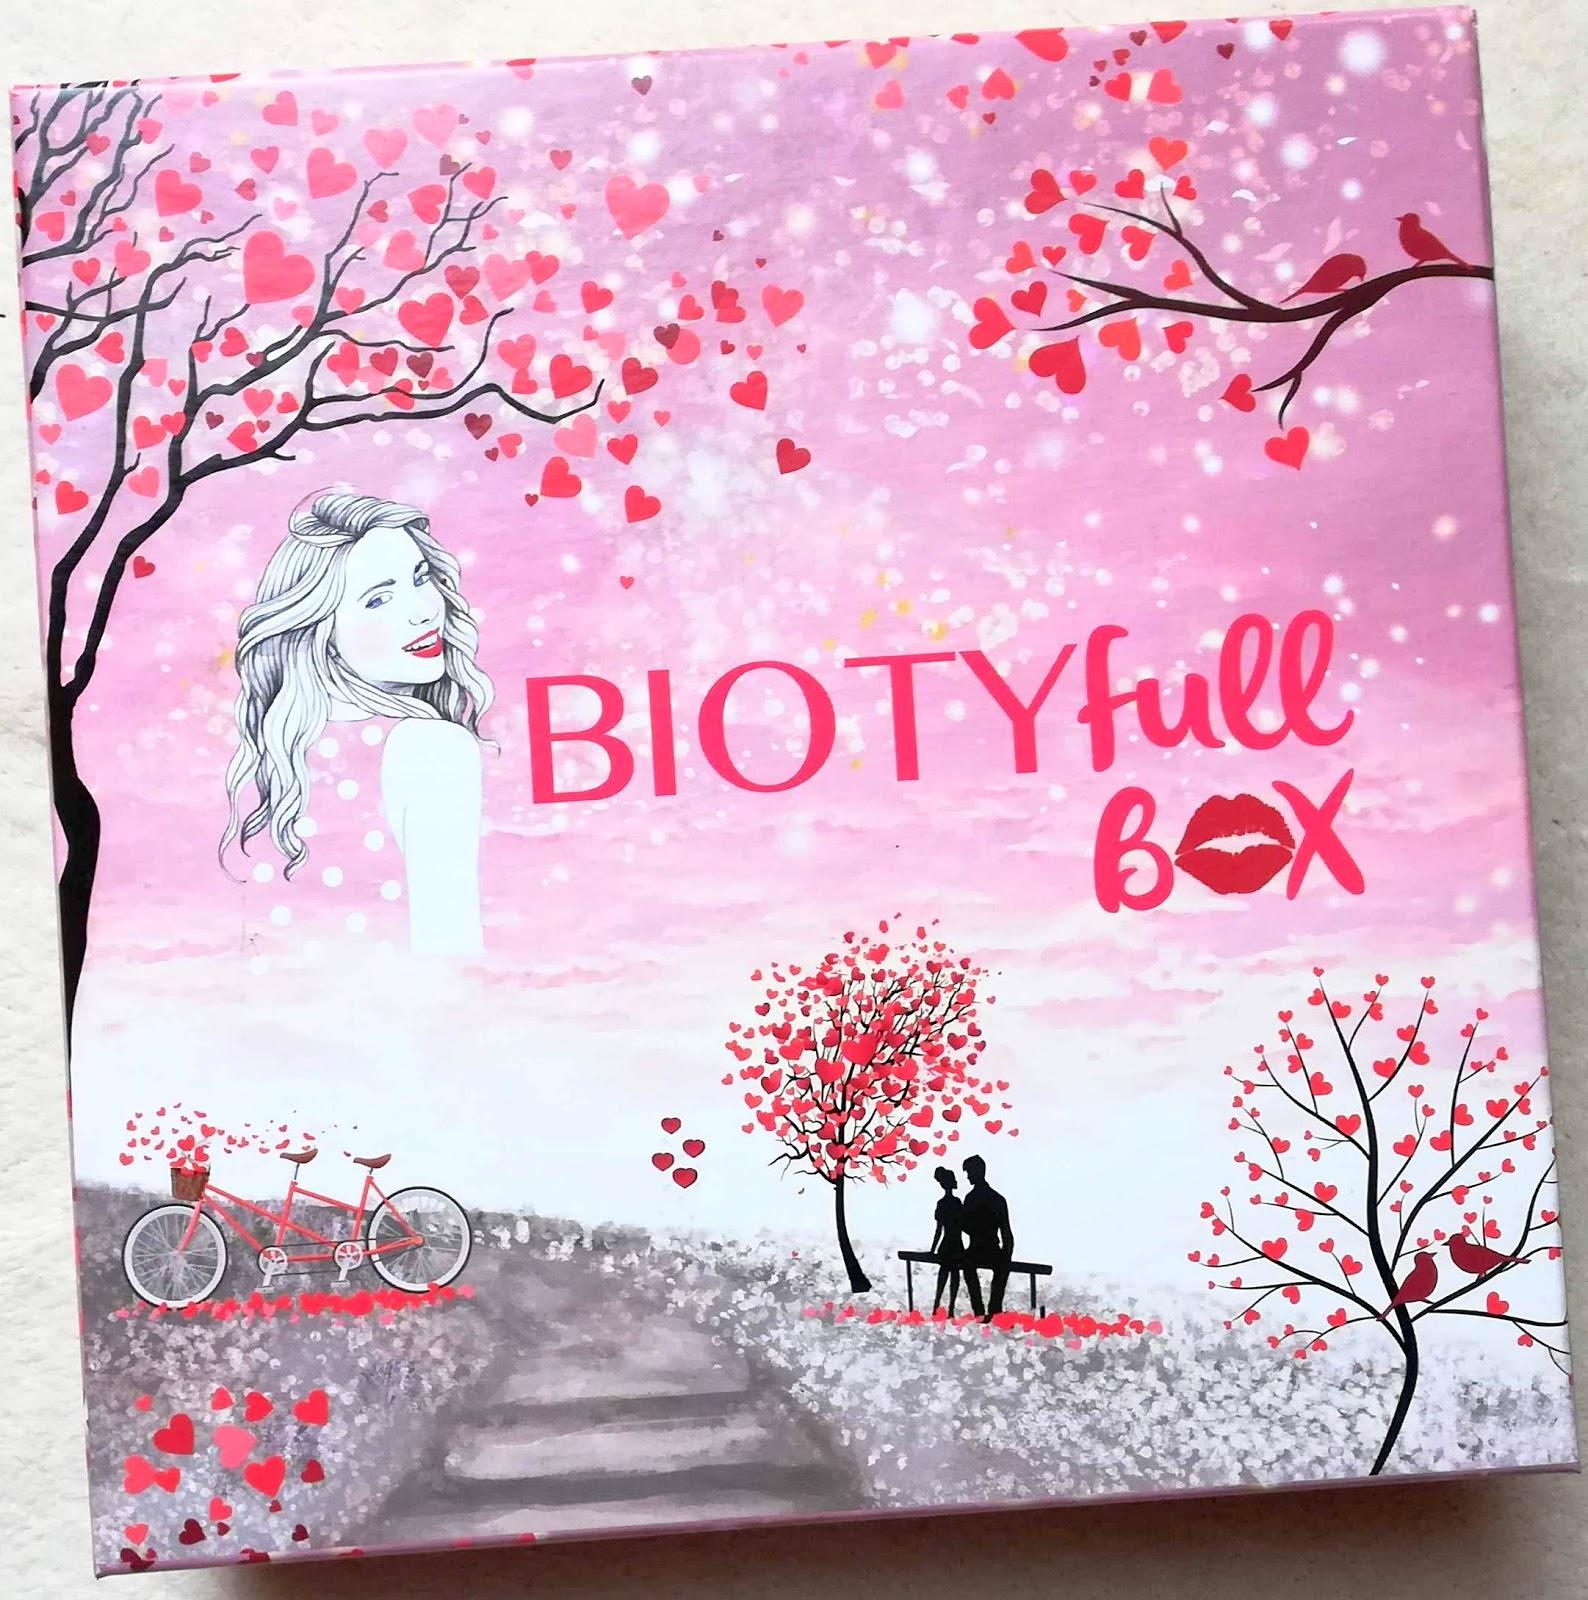 BIOTYFULL BOX Février 2019 : La Bienheureuse